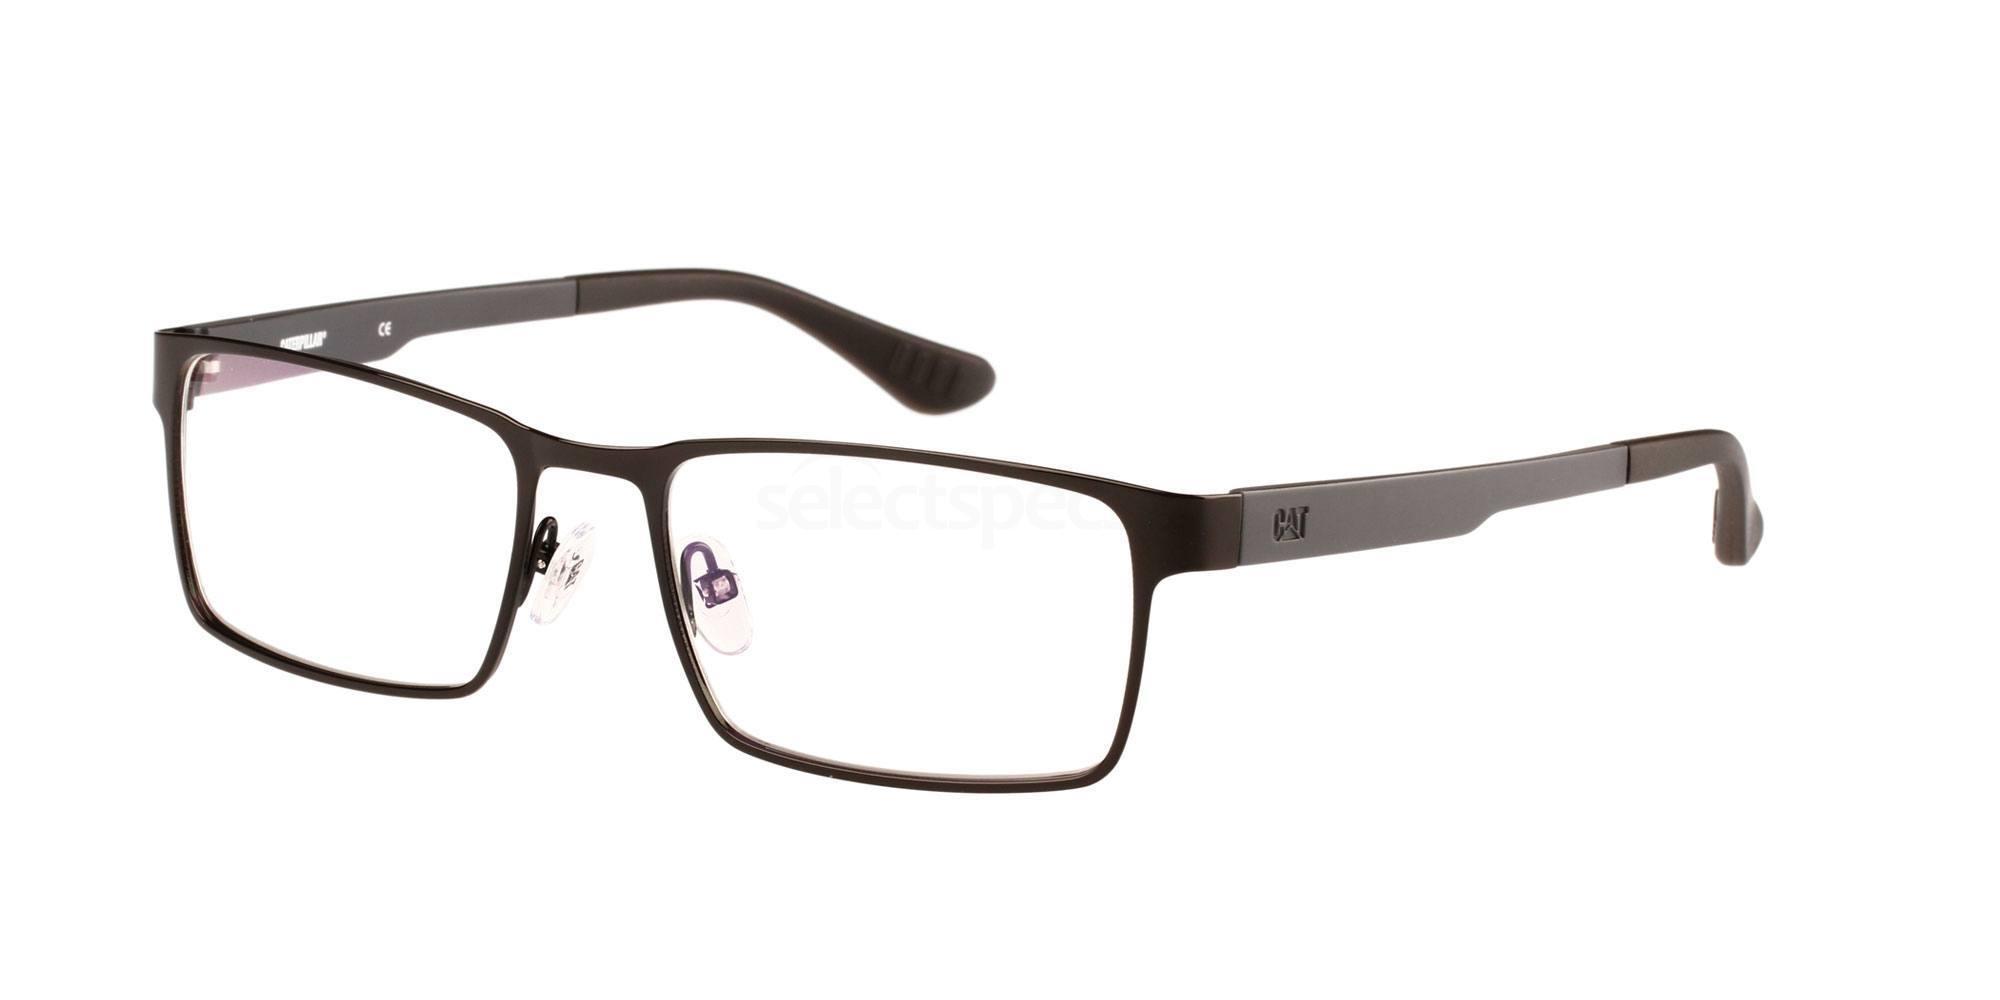 204 CTO J06 Glasses, CAT